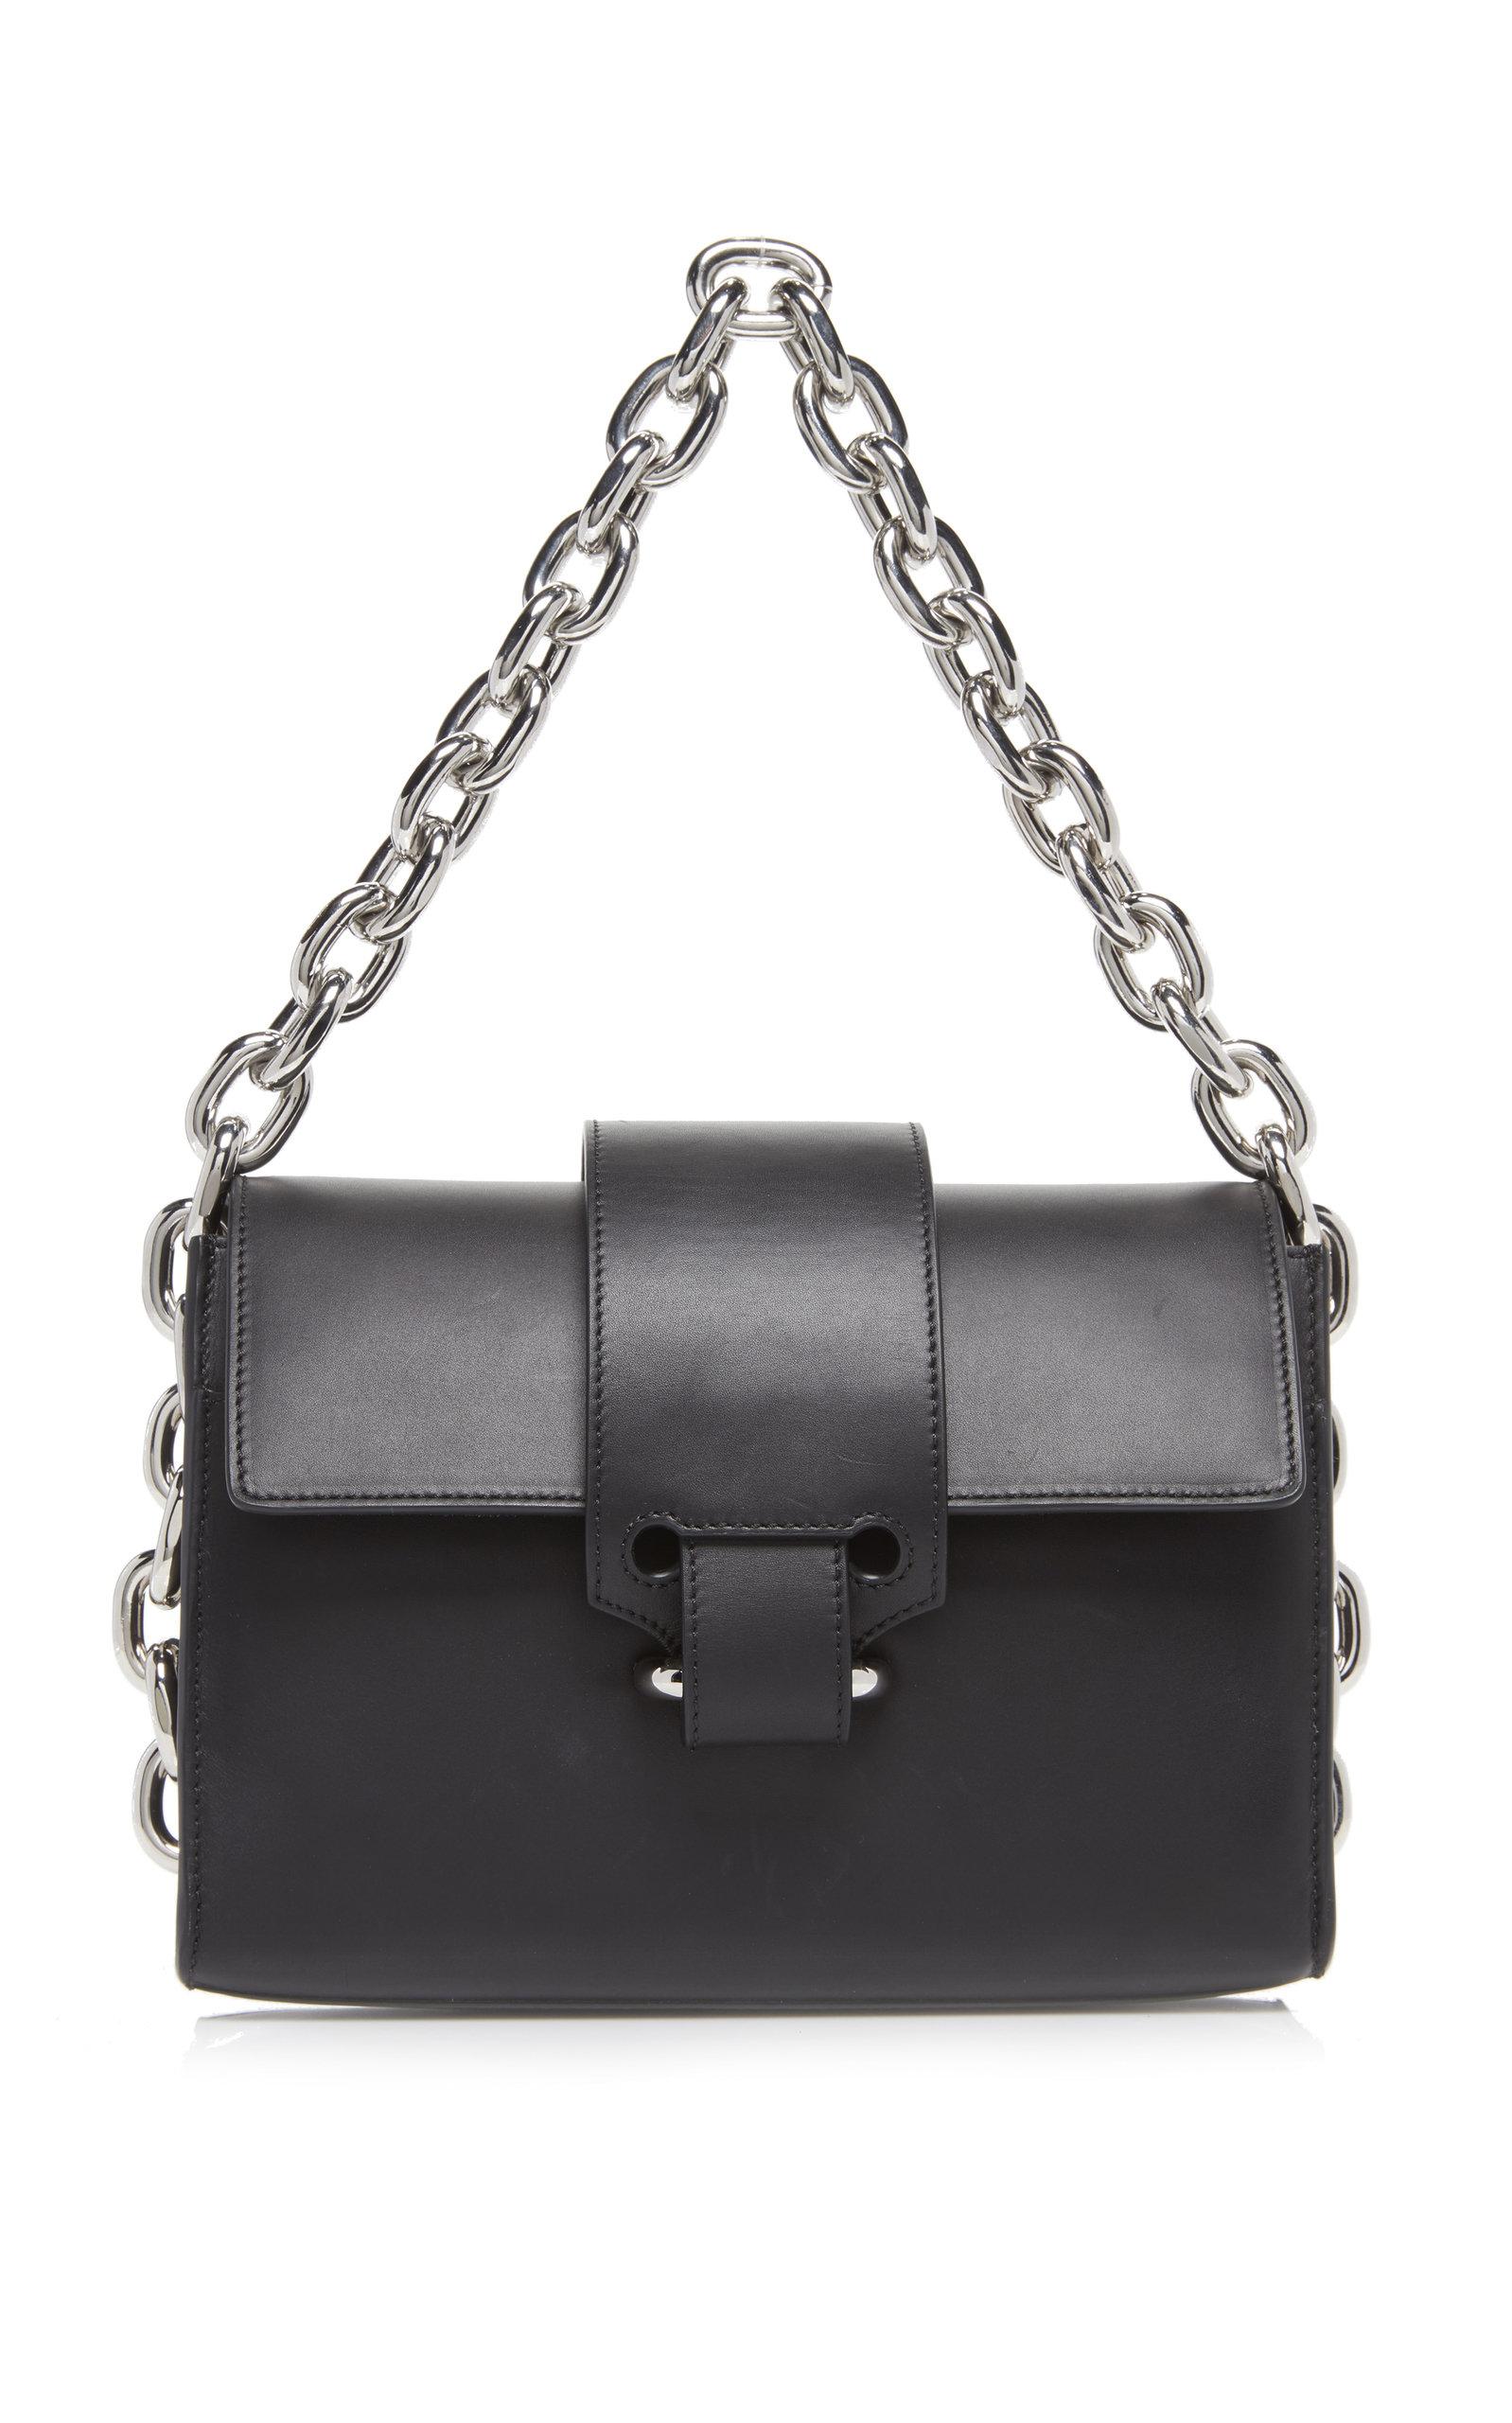 0b9de3eff9a5 Chainlink Leather Shoulder Bag by Paco Rabanne